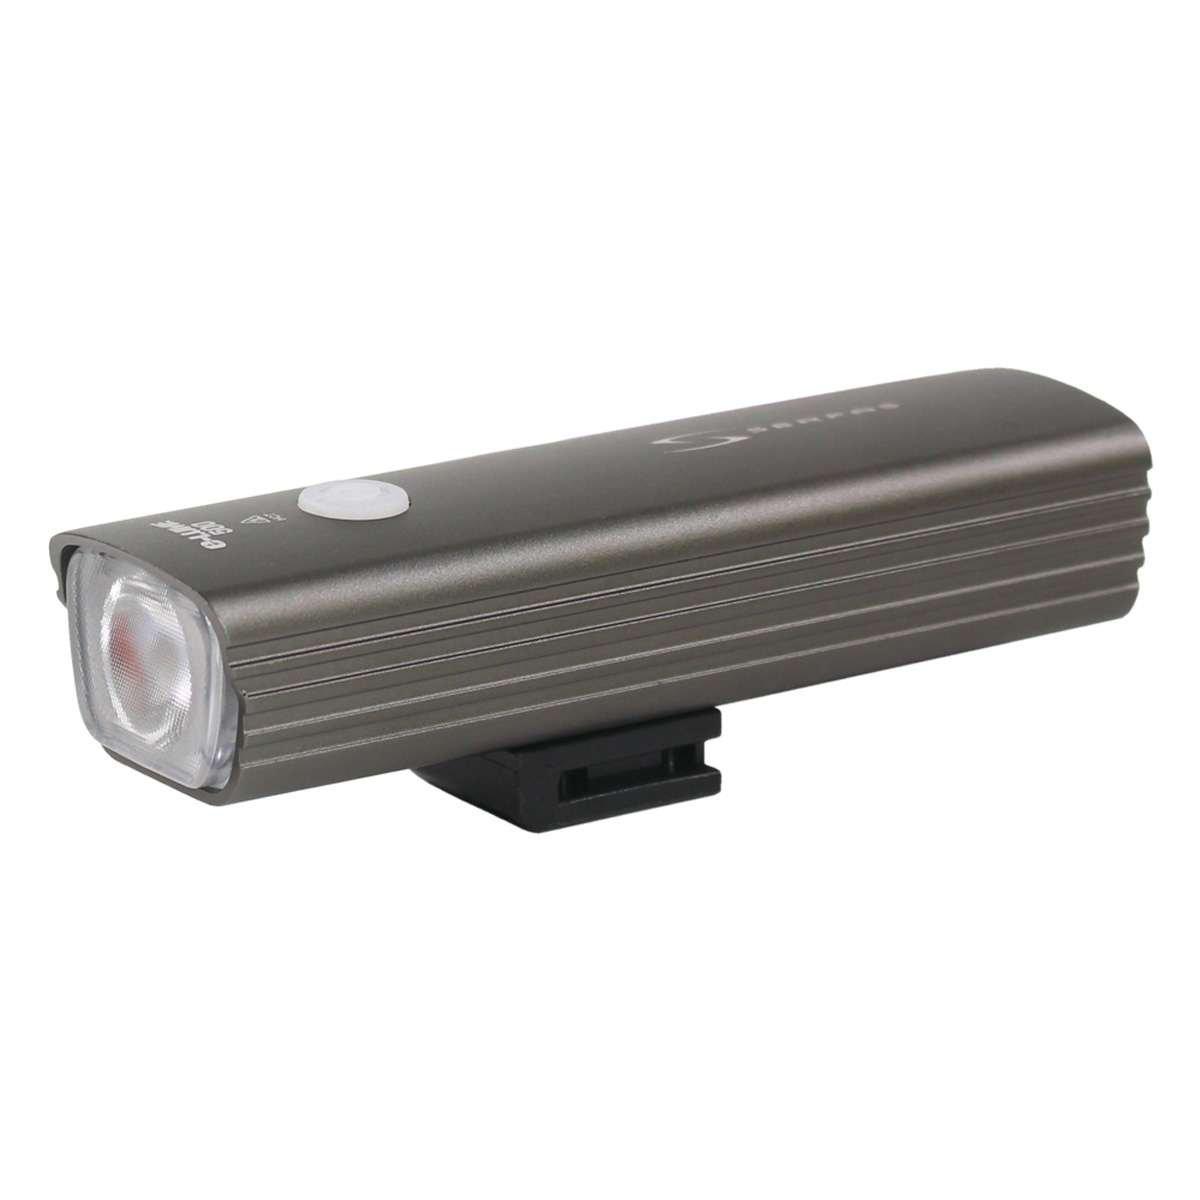 Serfas E-Lume 500 Bicycle Headlight - USL-500